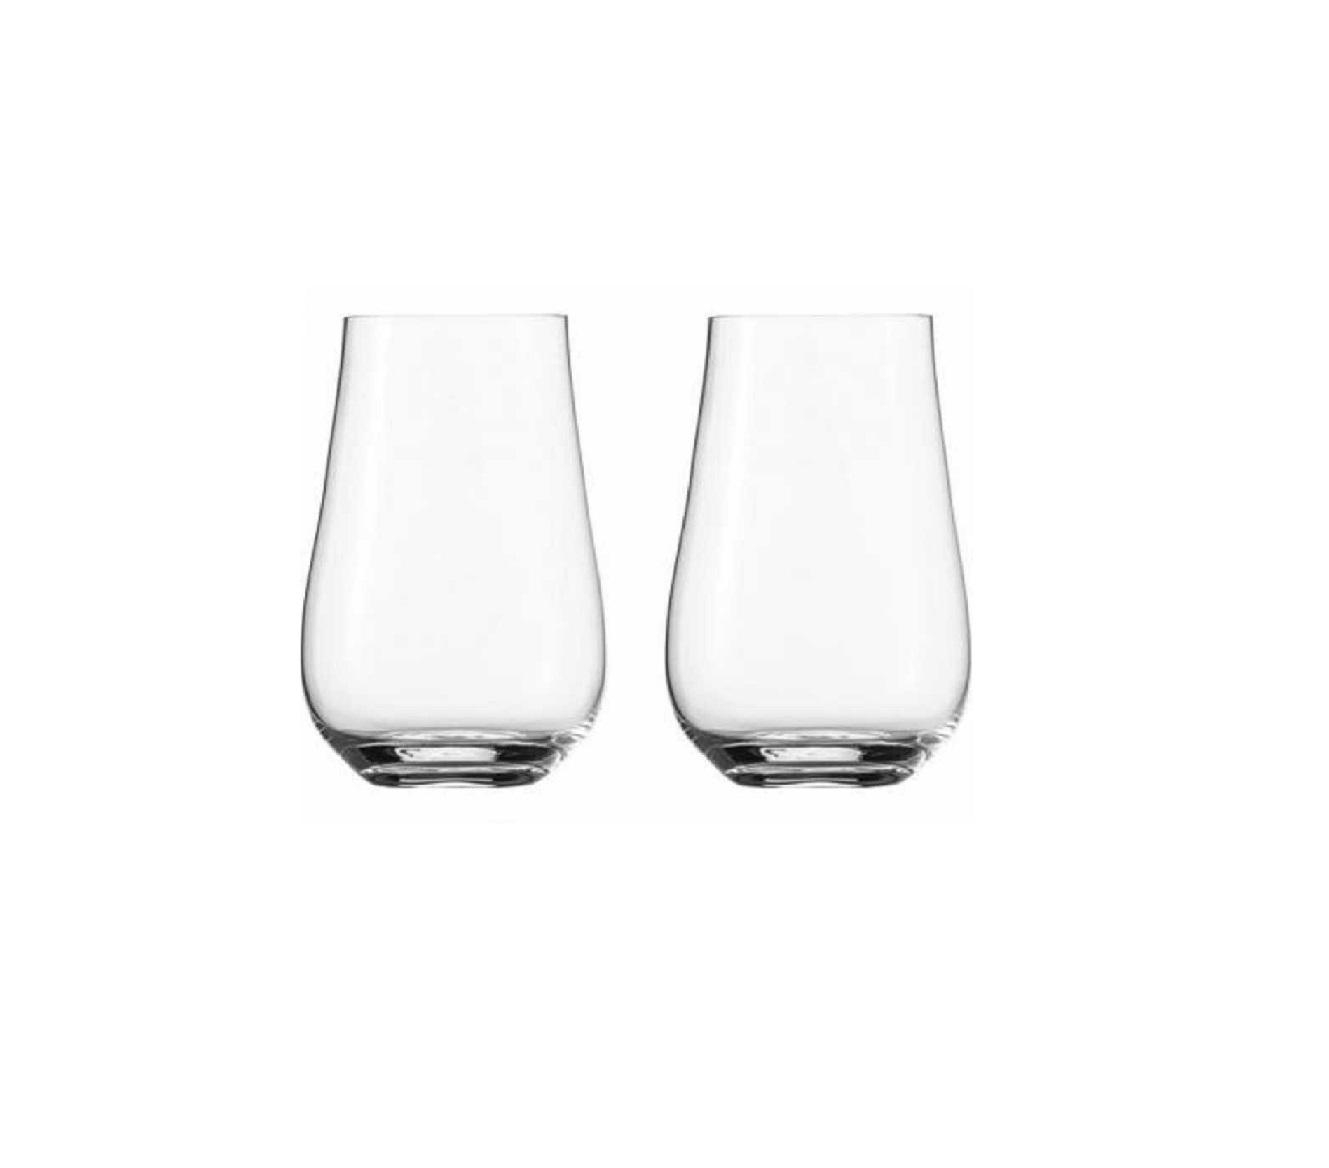 Набор стаканов Schott Zwiesel Smoothie, объем 0,54 л, прозрачный, 2 штуки Schott Zwiesel 119776 фото 1